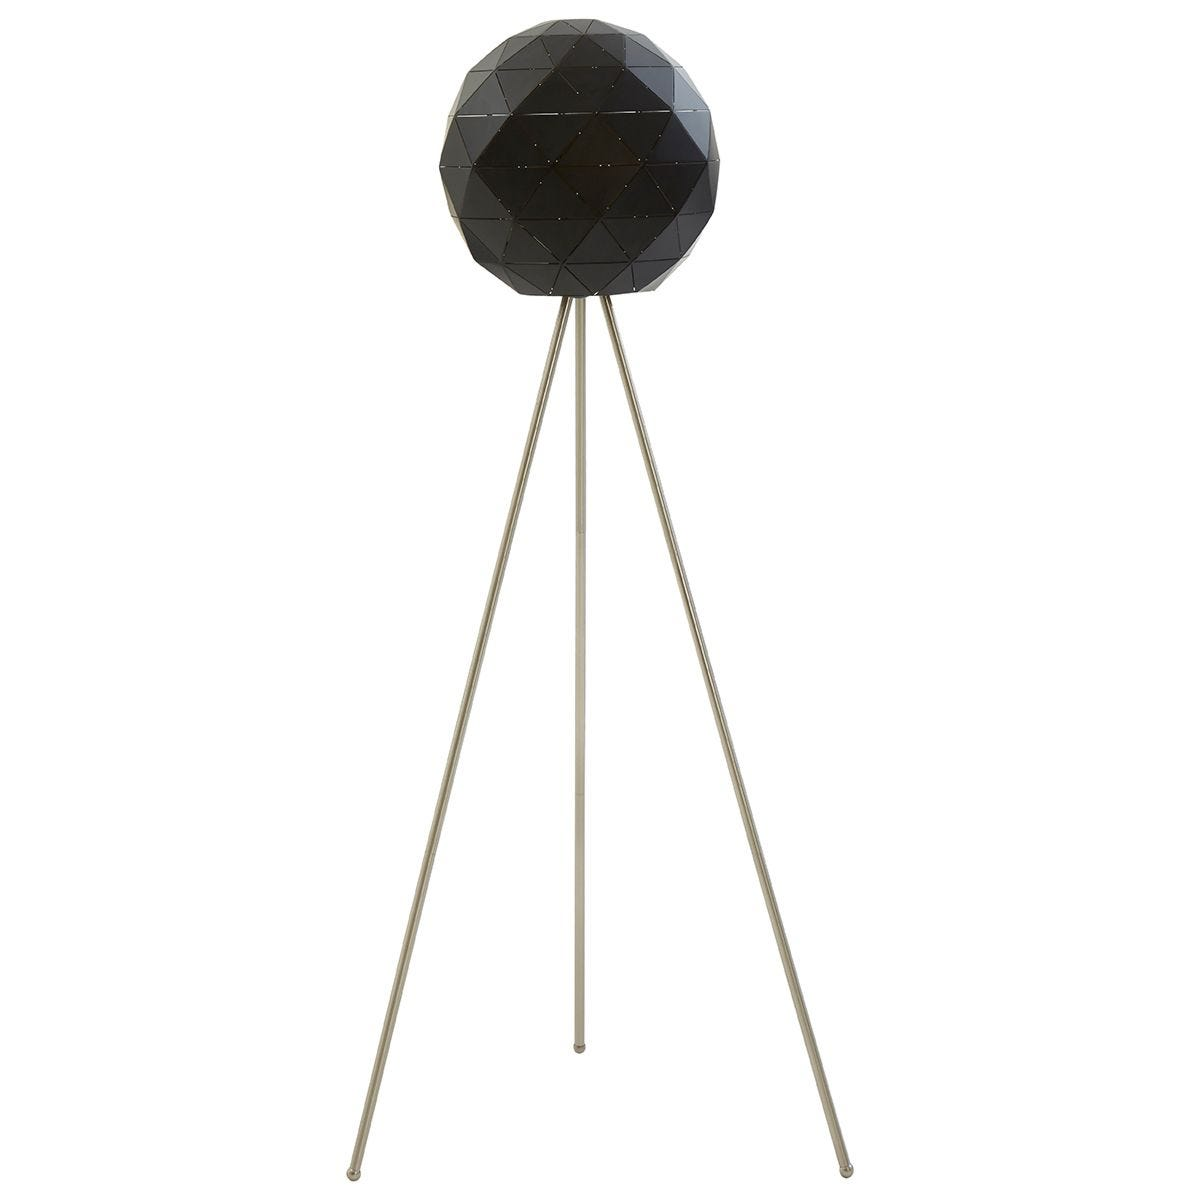 Premier Housewares Mateo Geometric Floor Lamp with Steel Base - Black